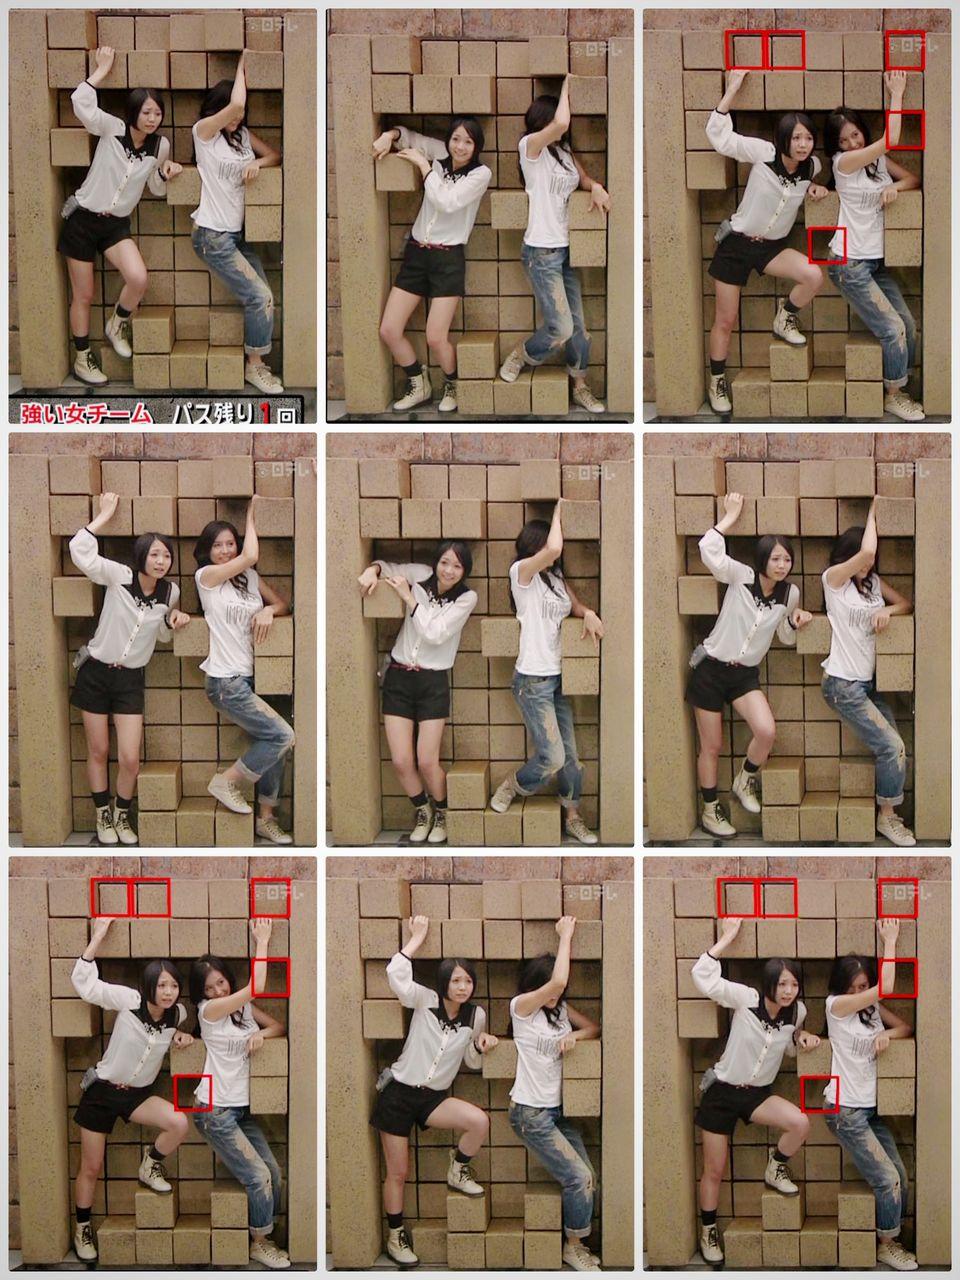 http://livedoor.blogimg.jp/idlekun-cutenadeshiko/imgs/f/1/f1796388.jpg